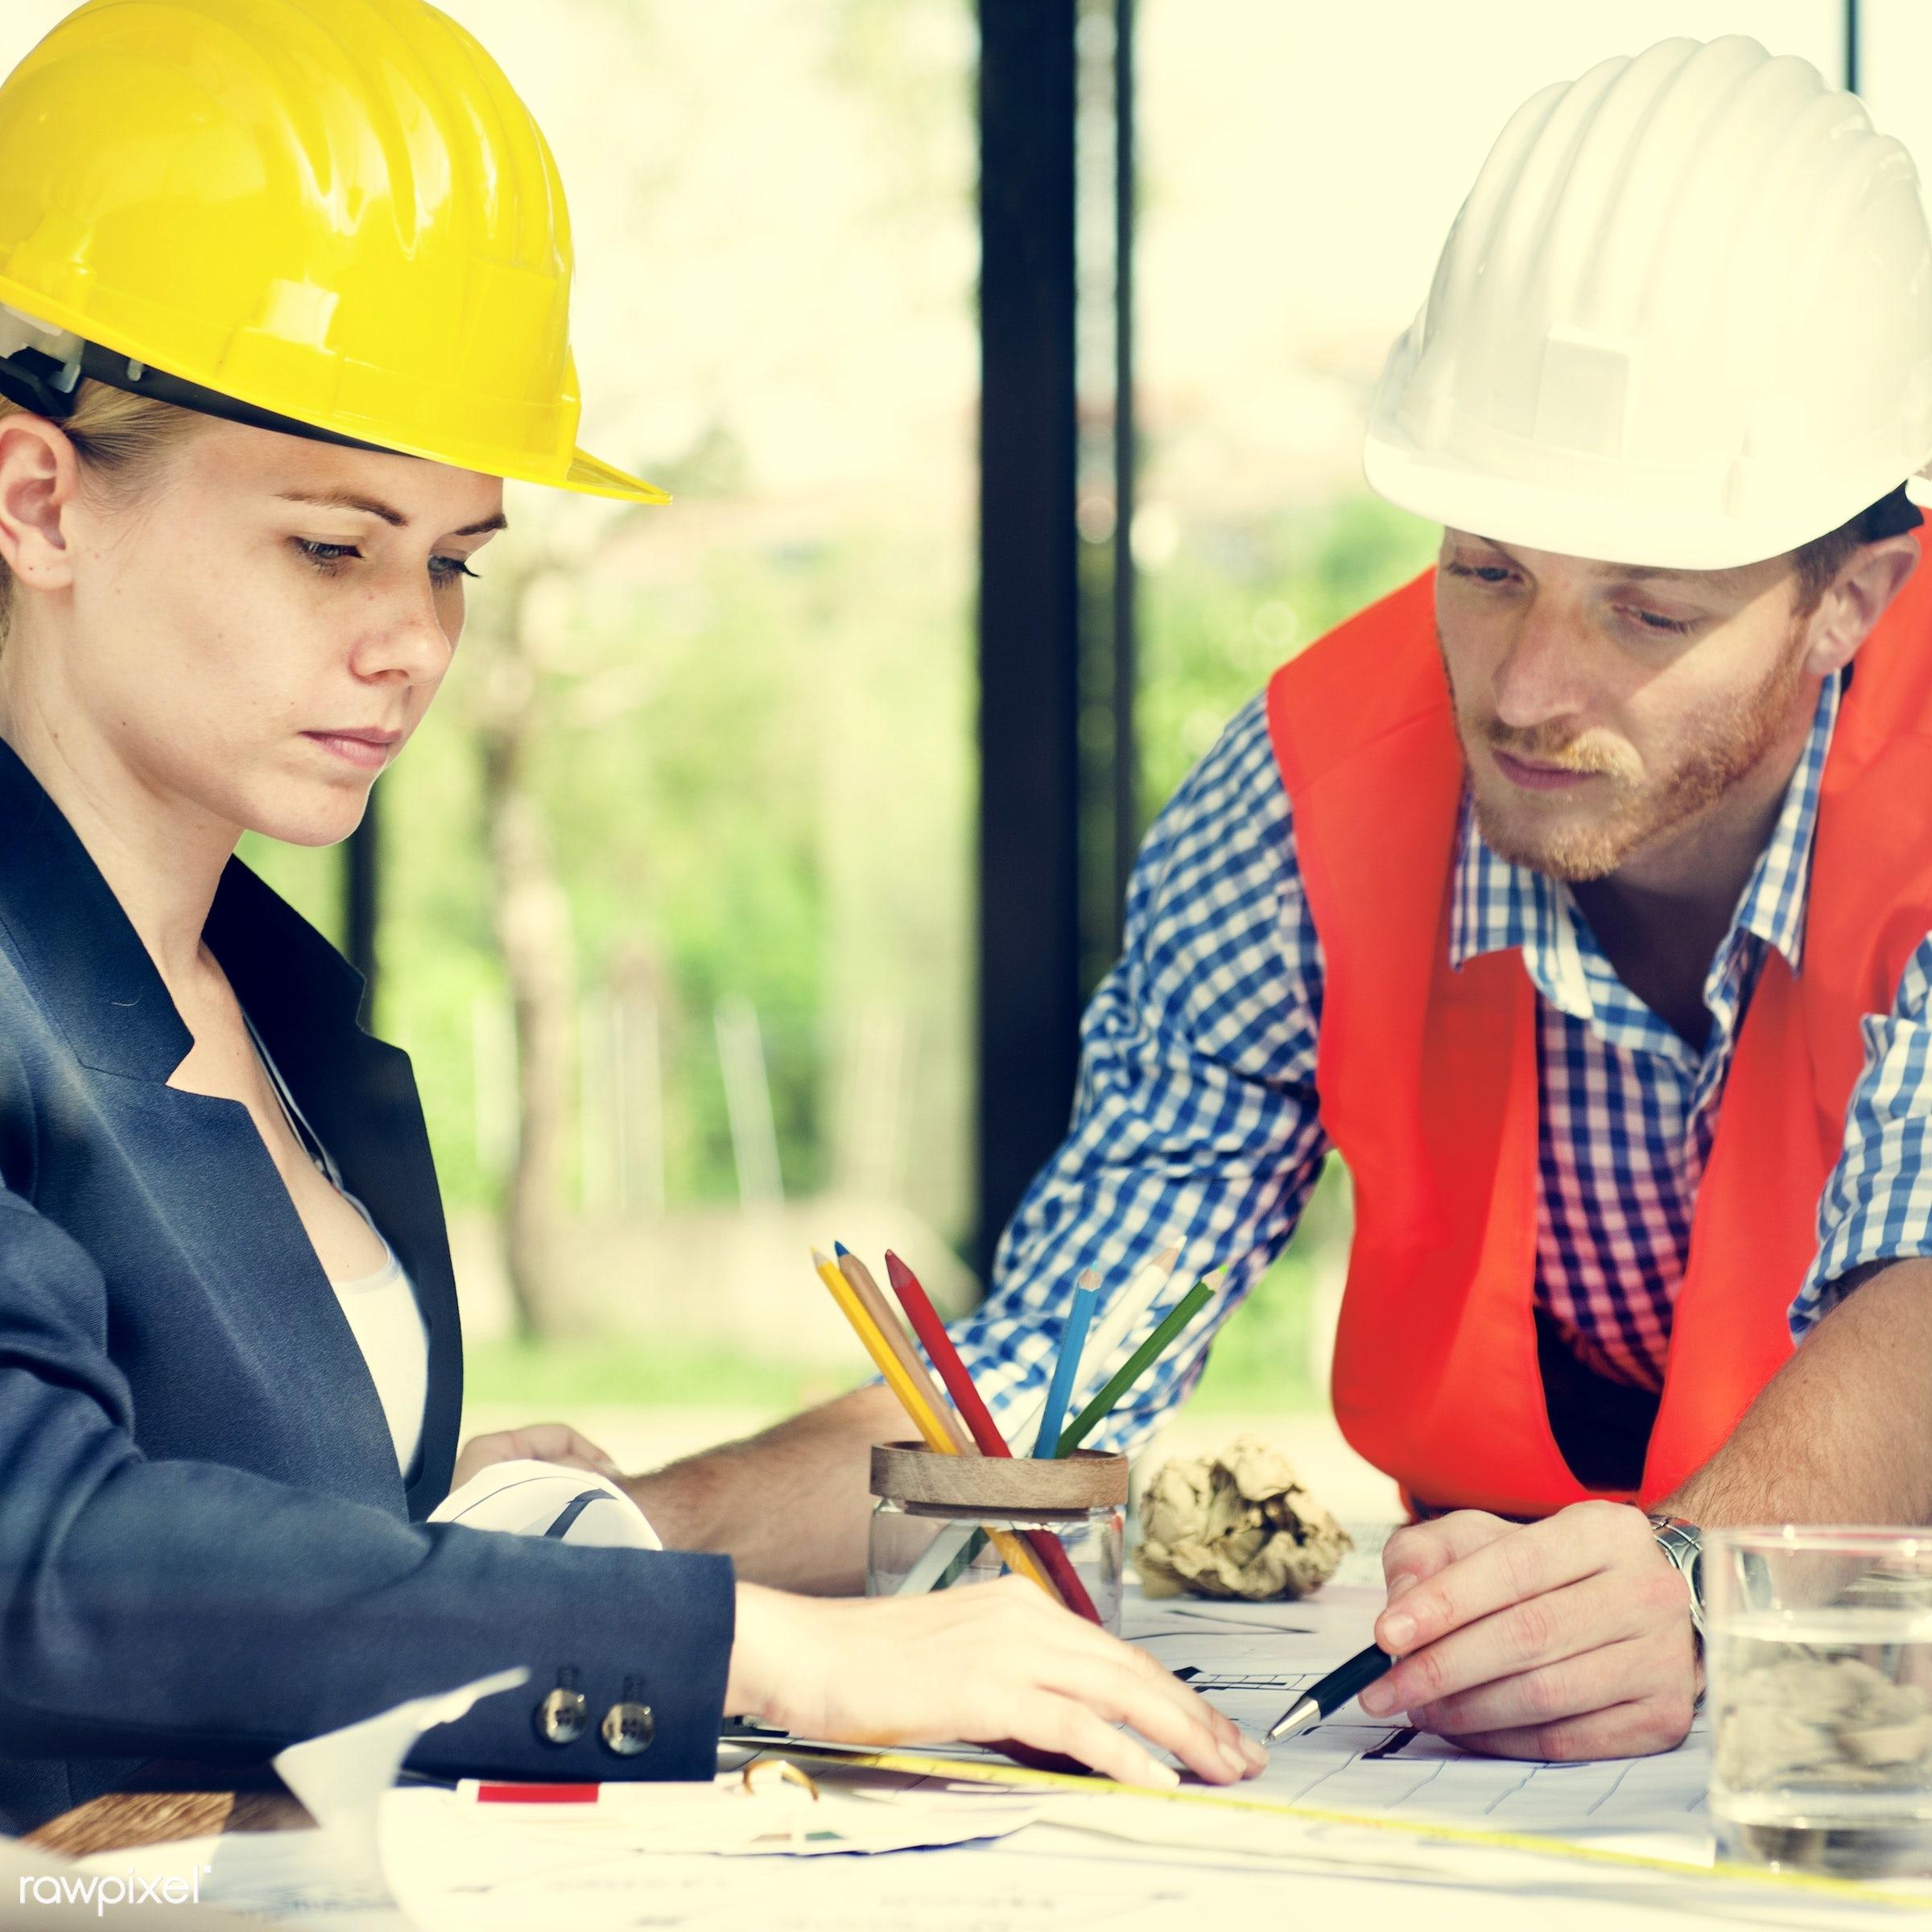 adult, architect, architecture, blueprint, brainstorming, business, businesswoman, communication, confidence, construction,...